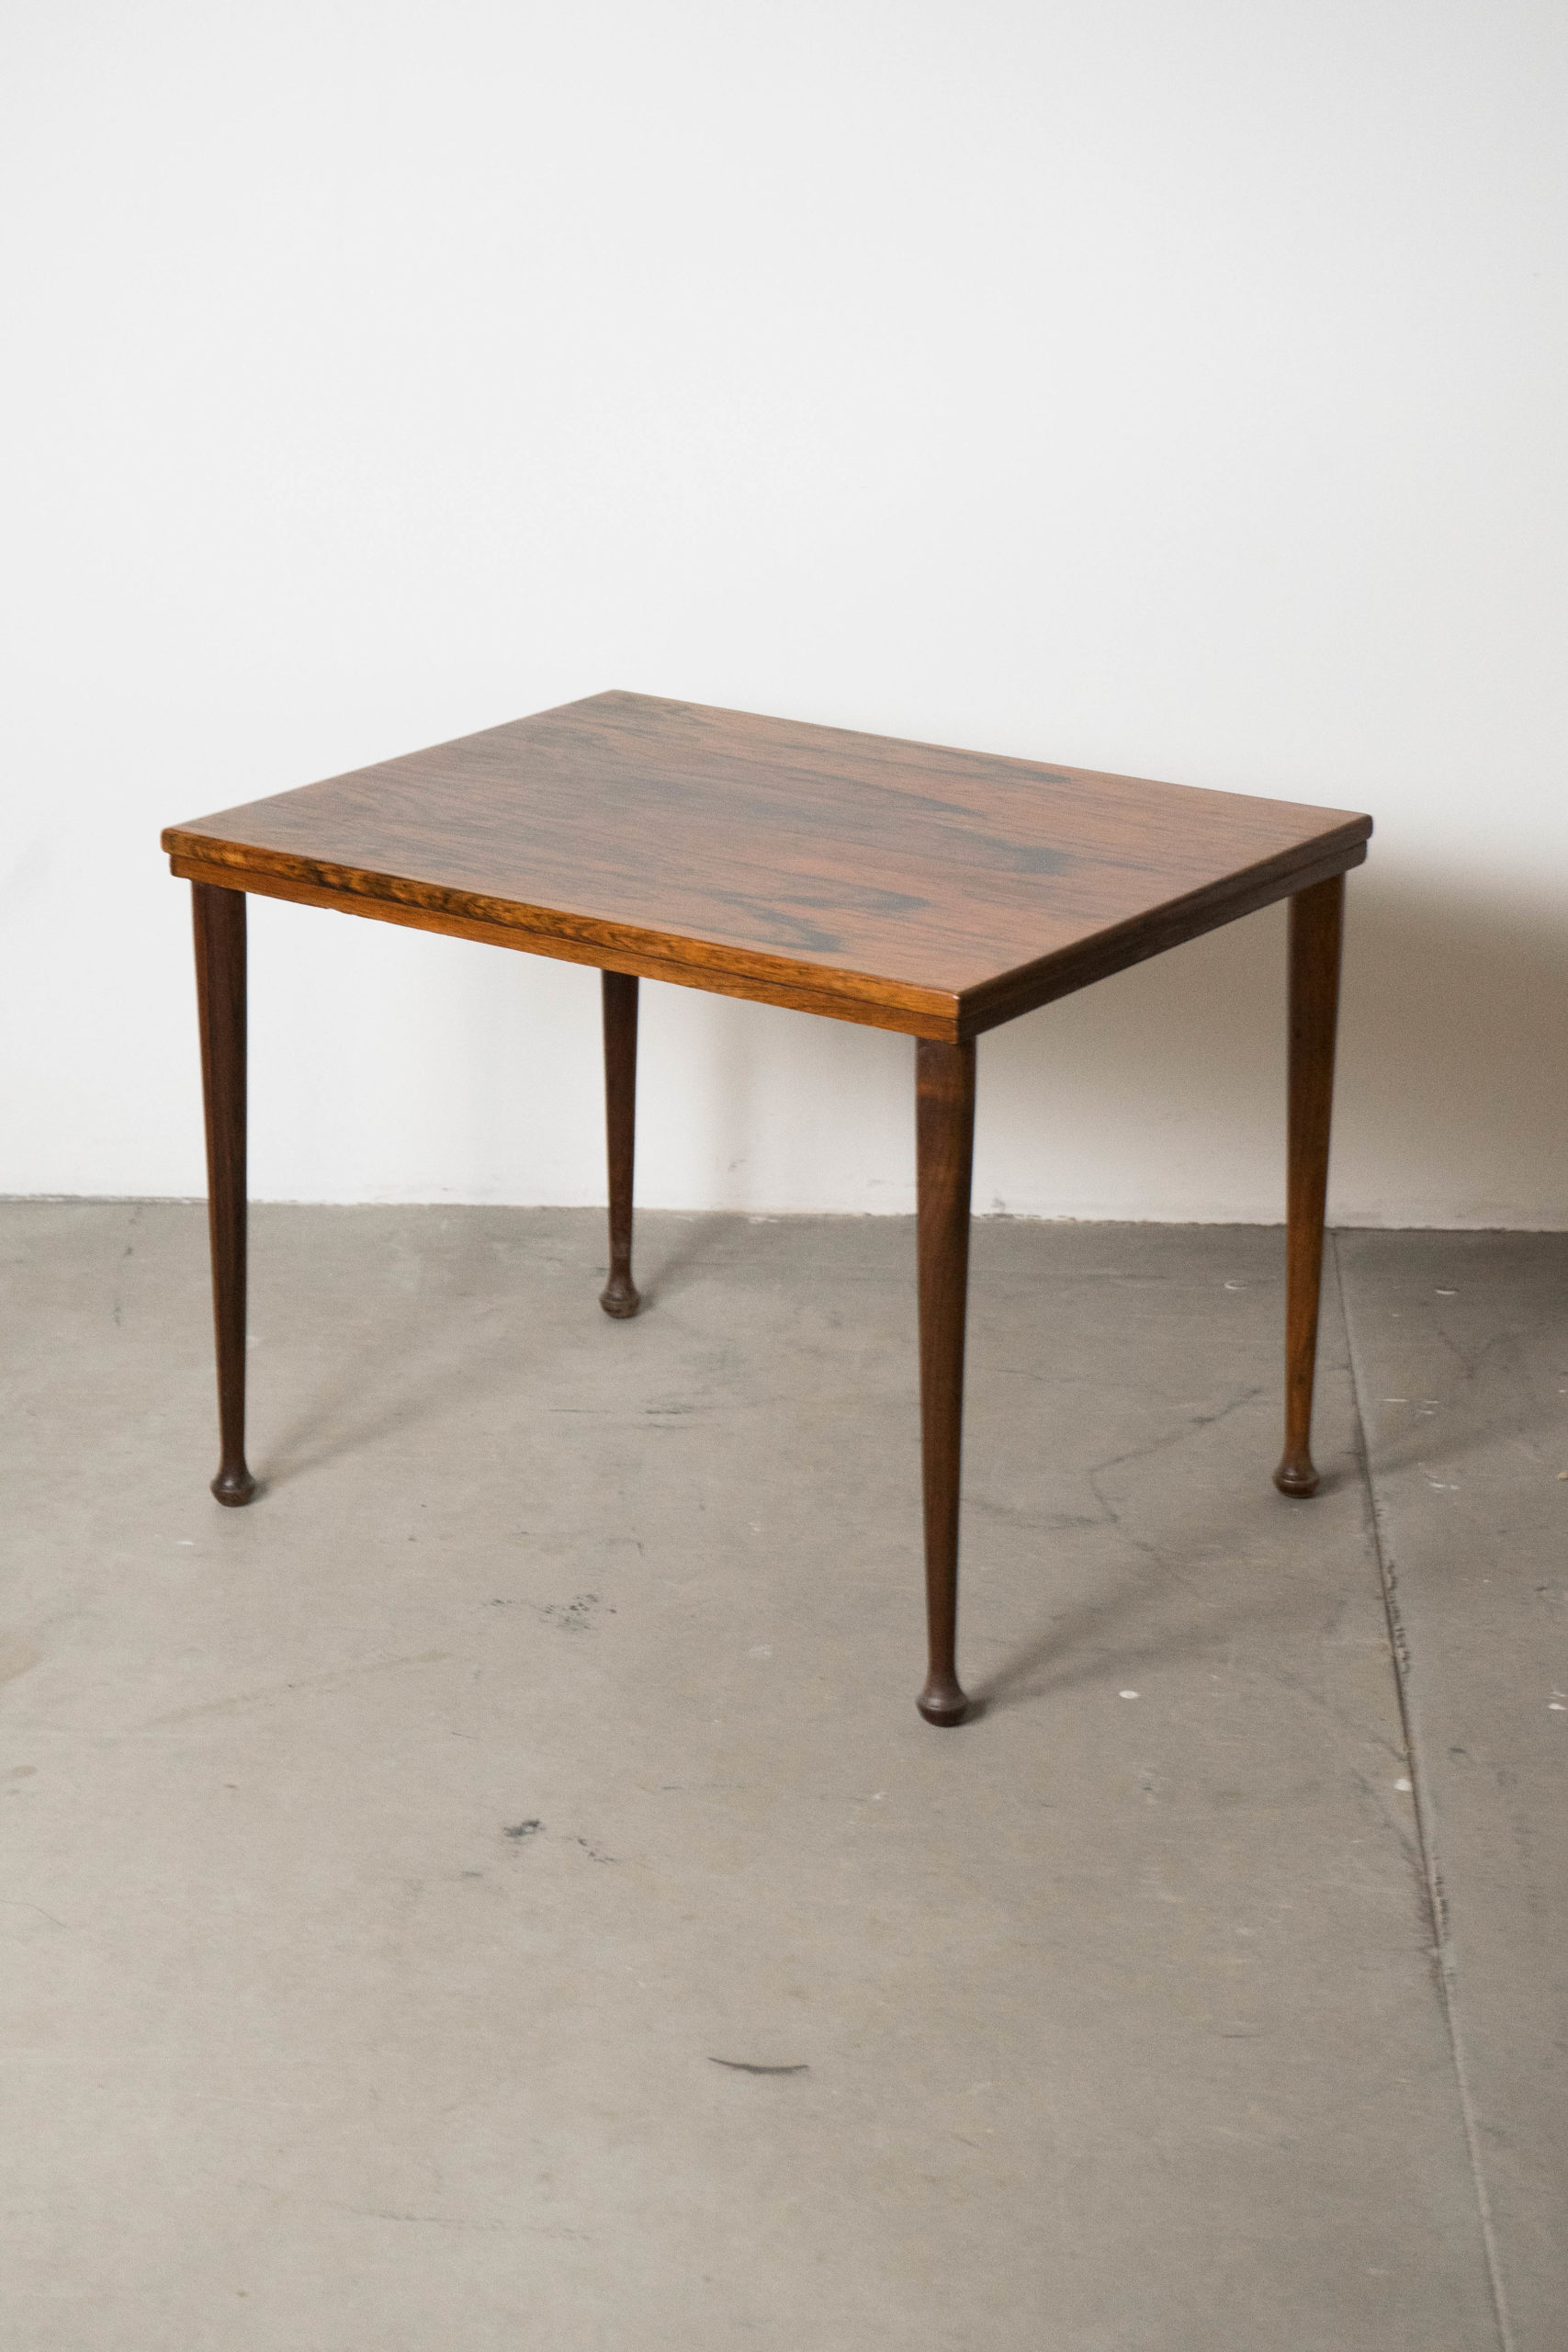 vista general de mesa de madera de palosanto